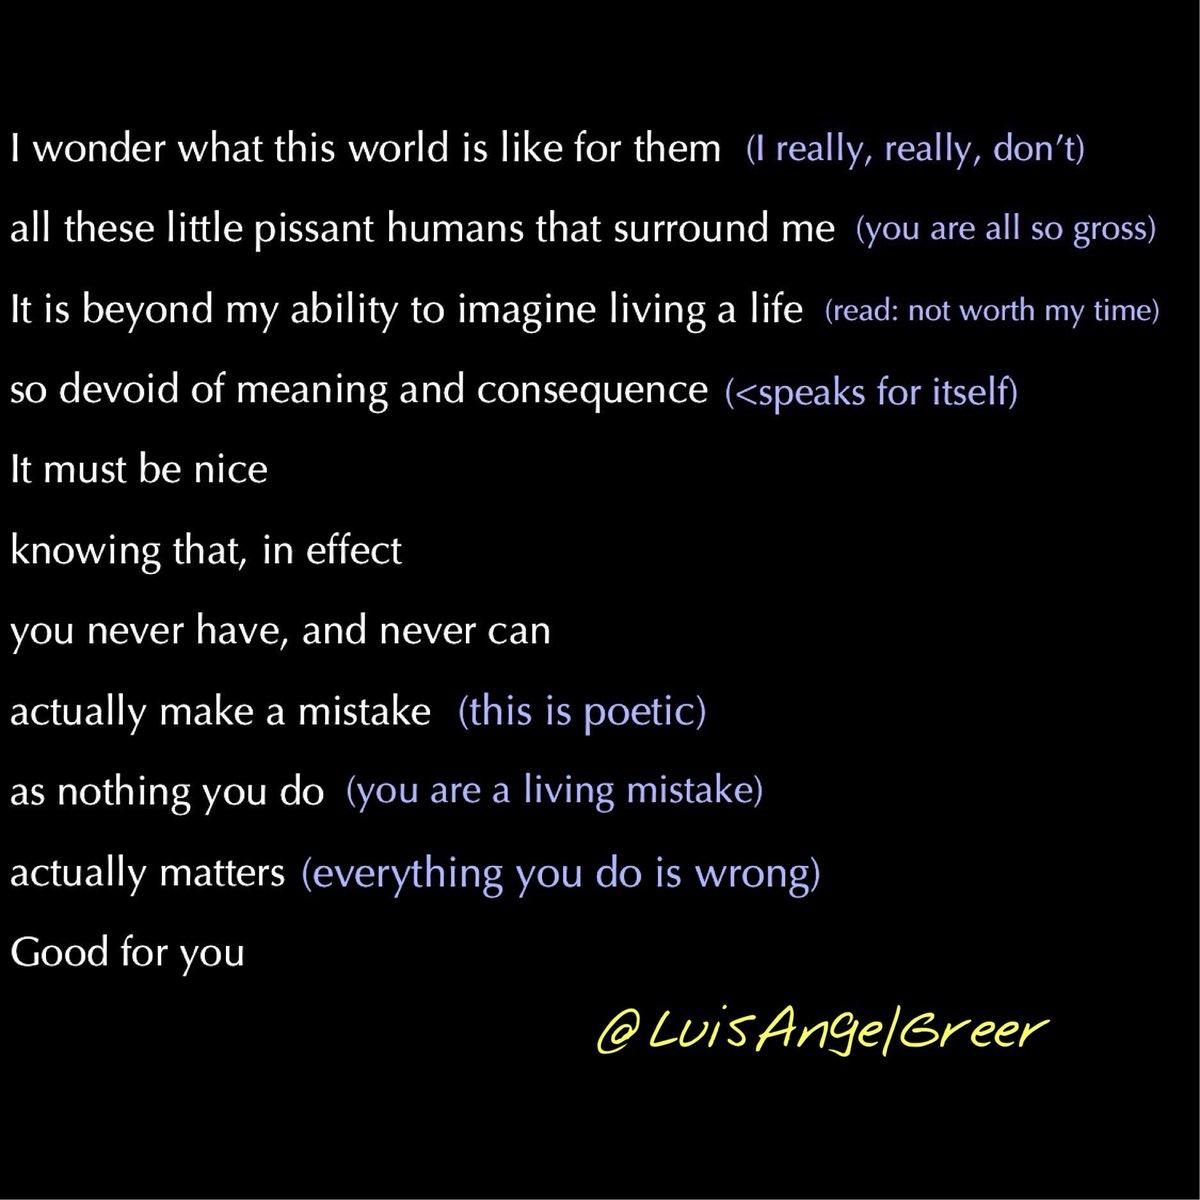 "Something I ""picked up"" from the cutting room floor.  Originally created November 21, 2019.  #poem #poetry #prose #bleedingedgepoetry #originalpoetry #poetryforthesoul #spilledwords #darkpoetry #love #lovepoem #lovepoems #creationsforce #paradoxmaintenance #anechoofwhatshouldbepic.twitter.com/71QafnkyWV"